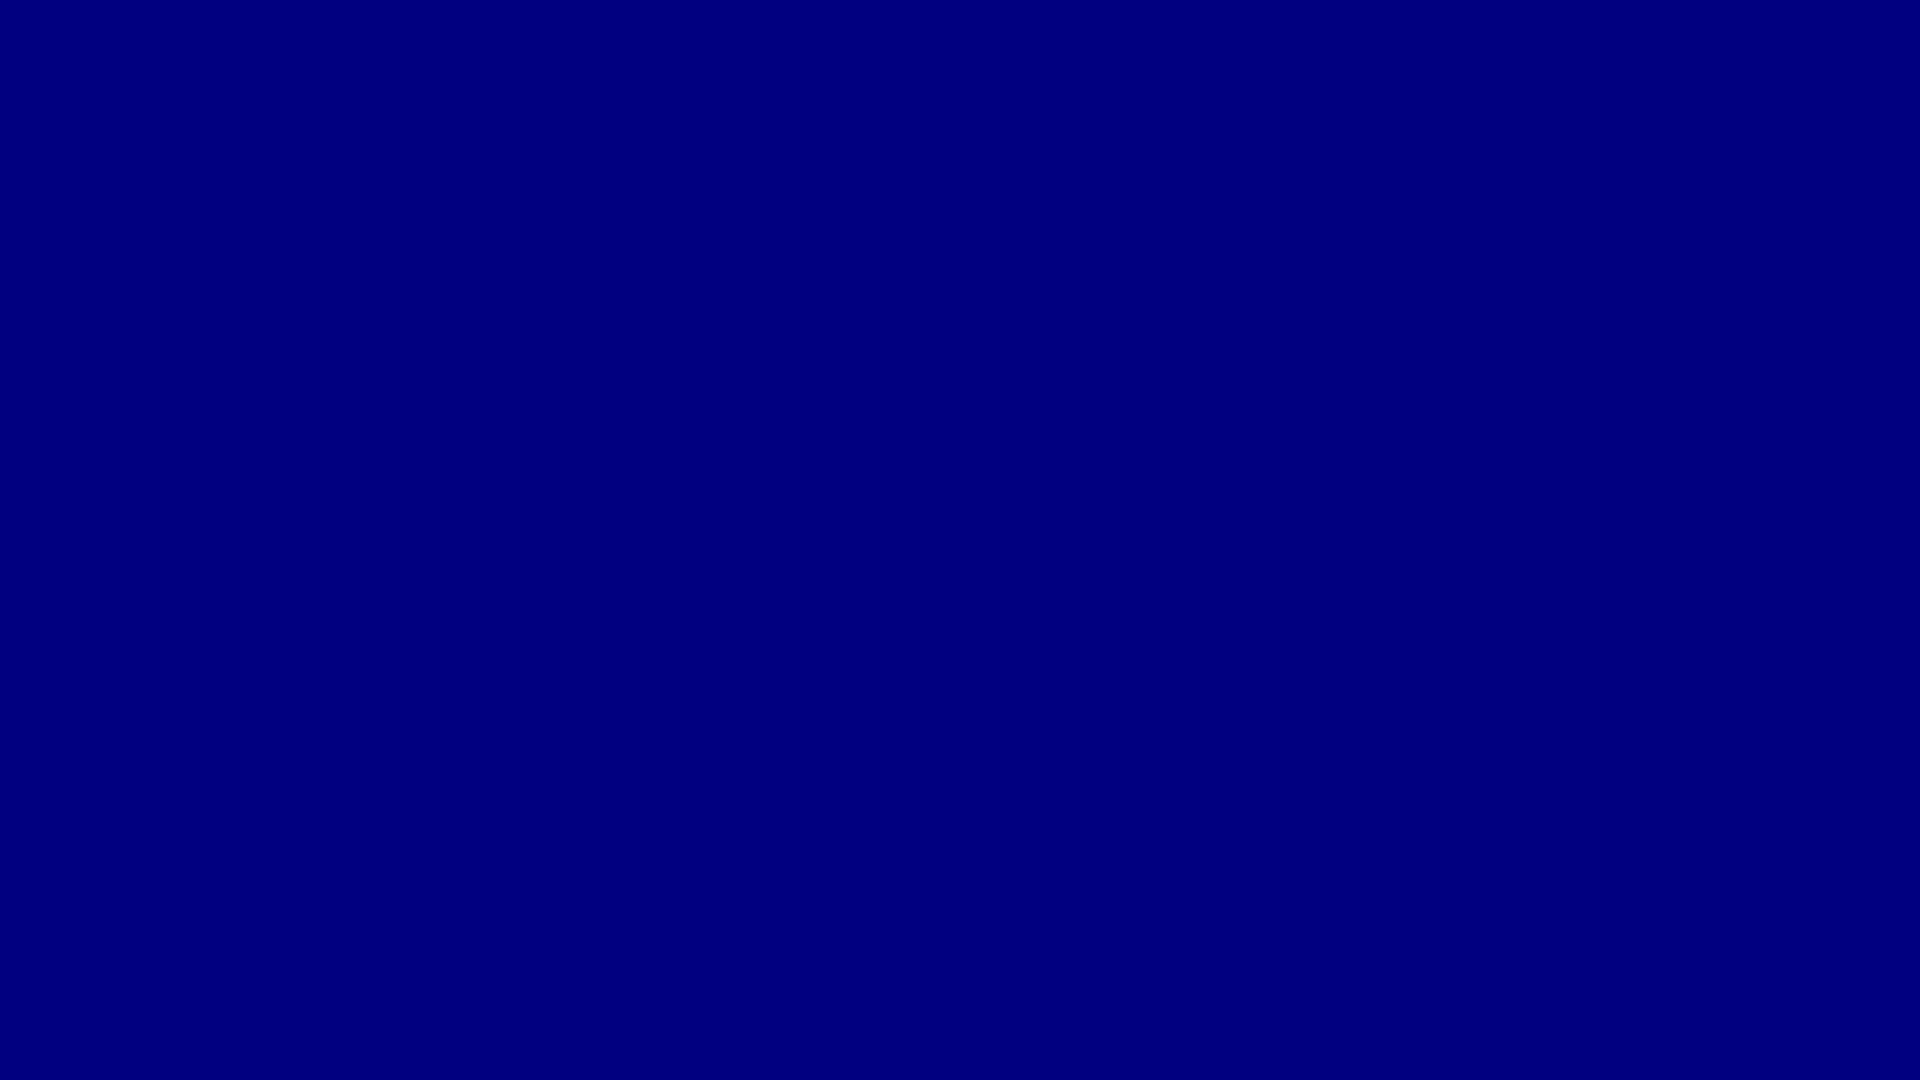 Navy Blue Solid Color Background